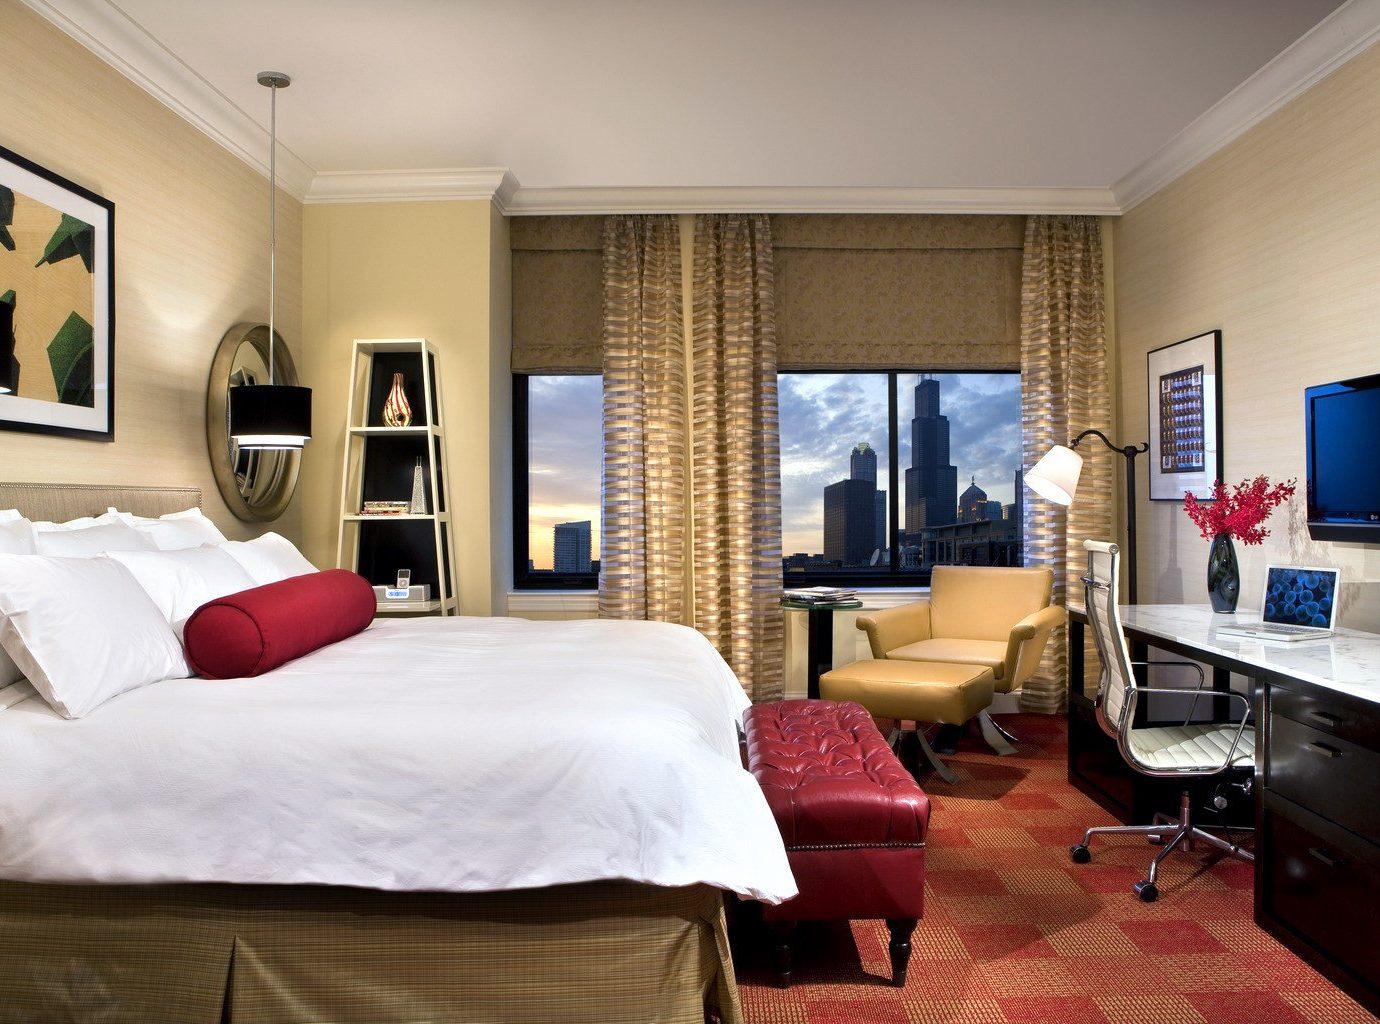 Bedroom City Elegant Hip Luxury Modern Scenic views Suite Trip Ideas property living room home cottage condominium Villa